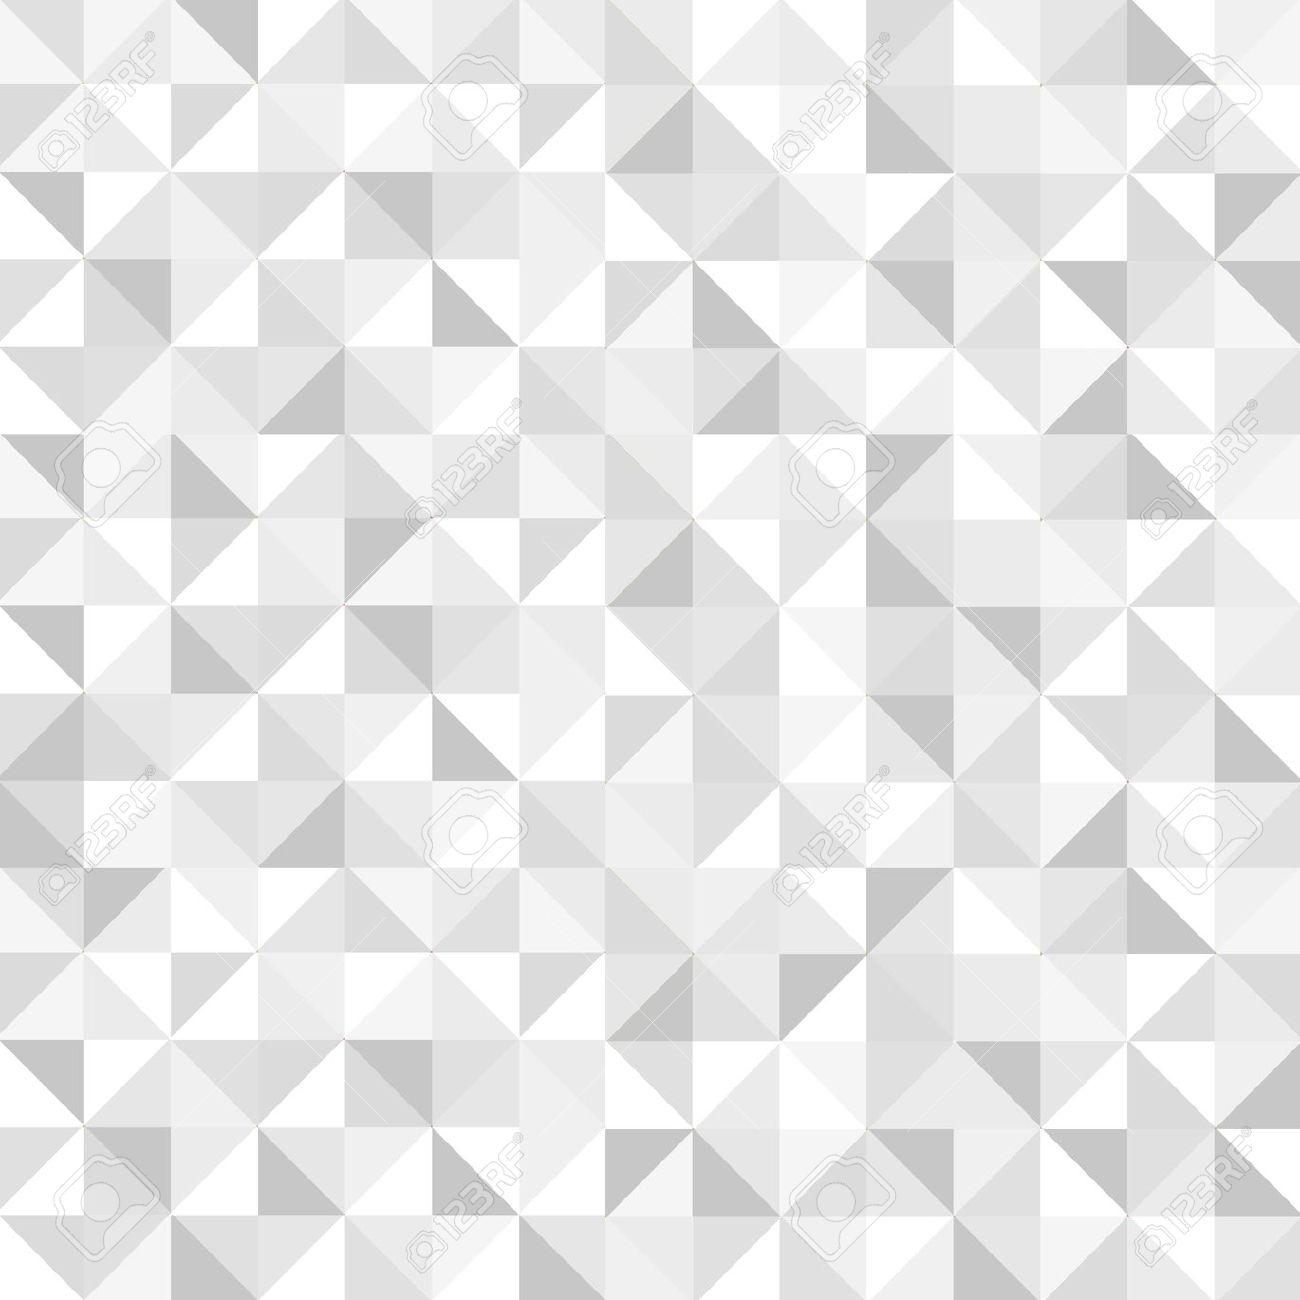 Black And White Vintage Desktop Wallpaper